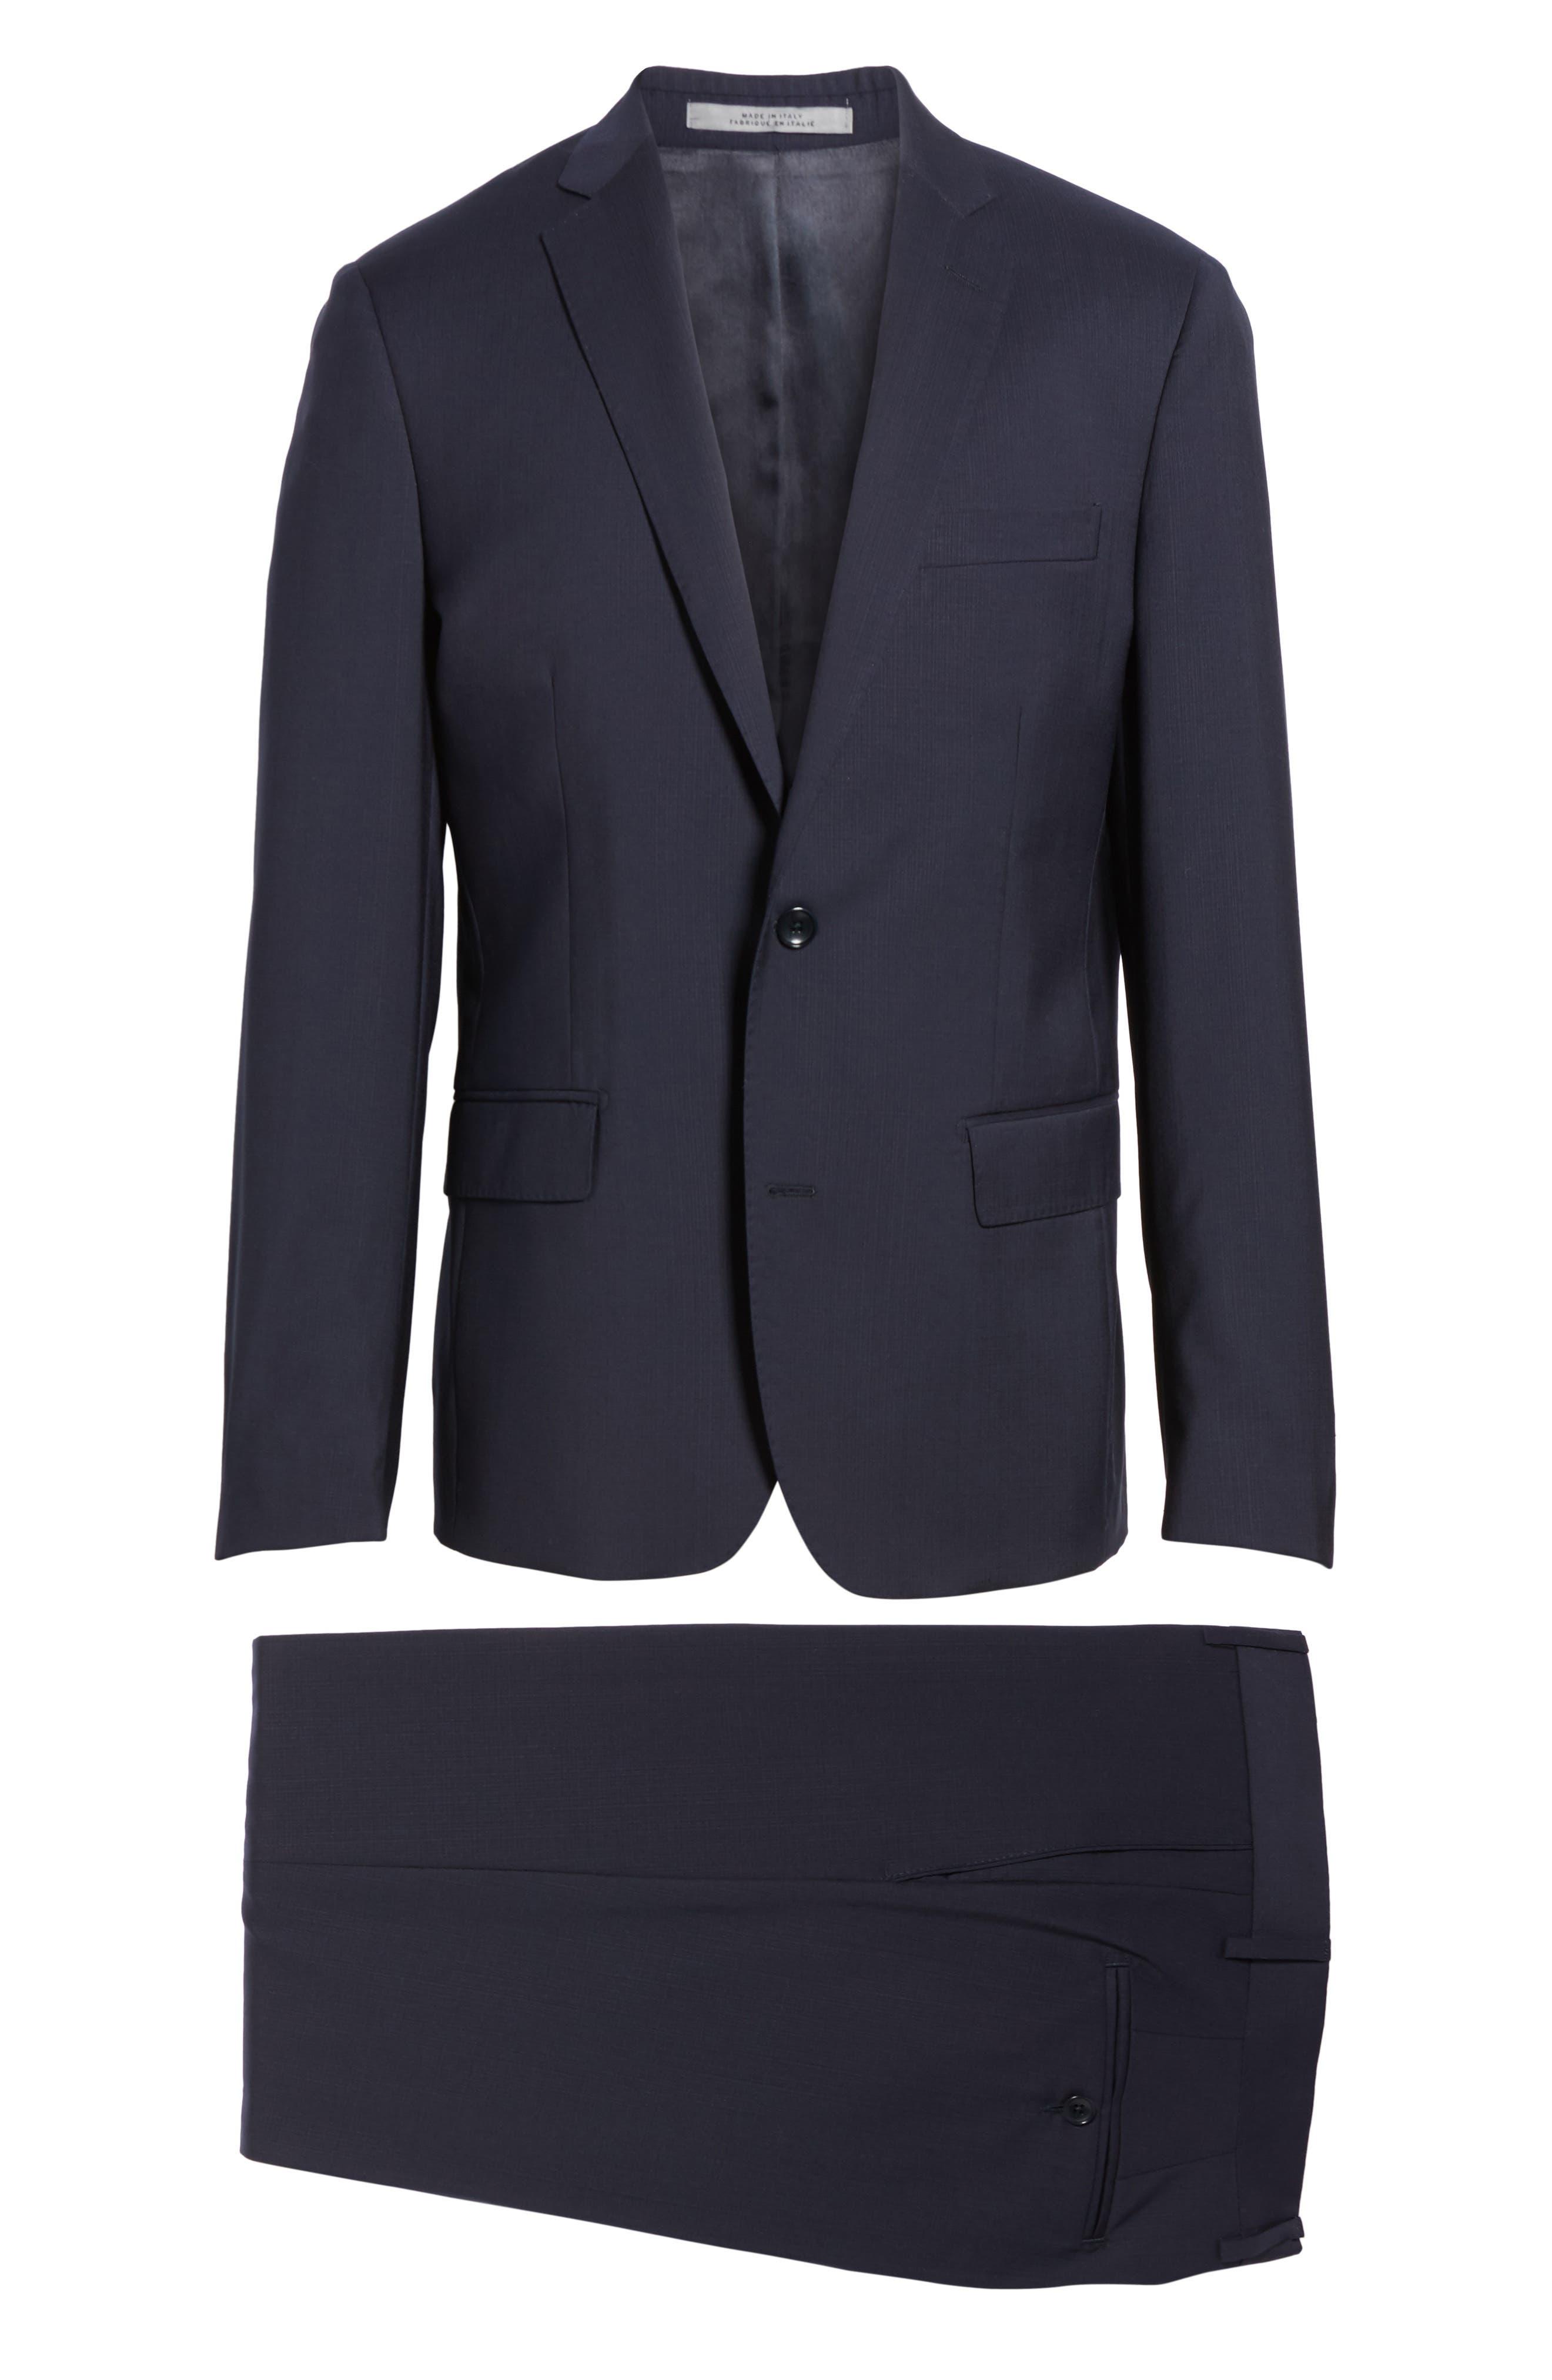 Classic Fit Check Suit,                             Alternate thumbnail 8, color,                             Navy